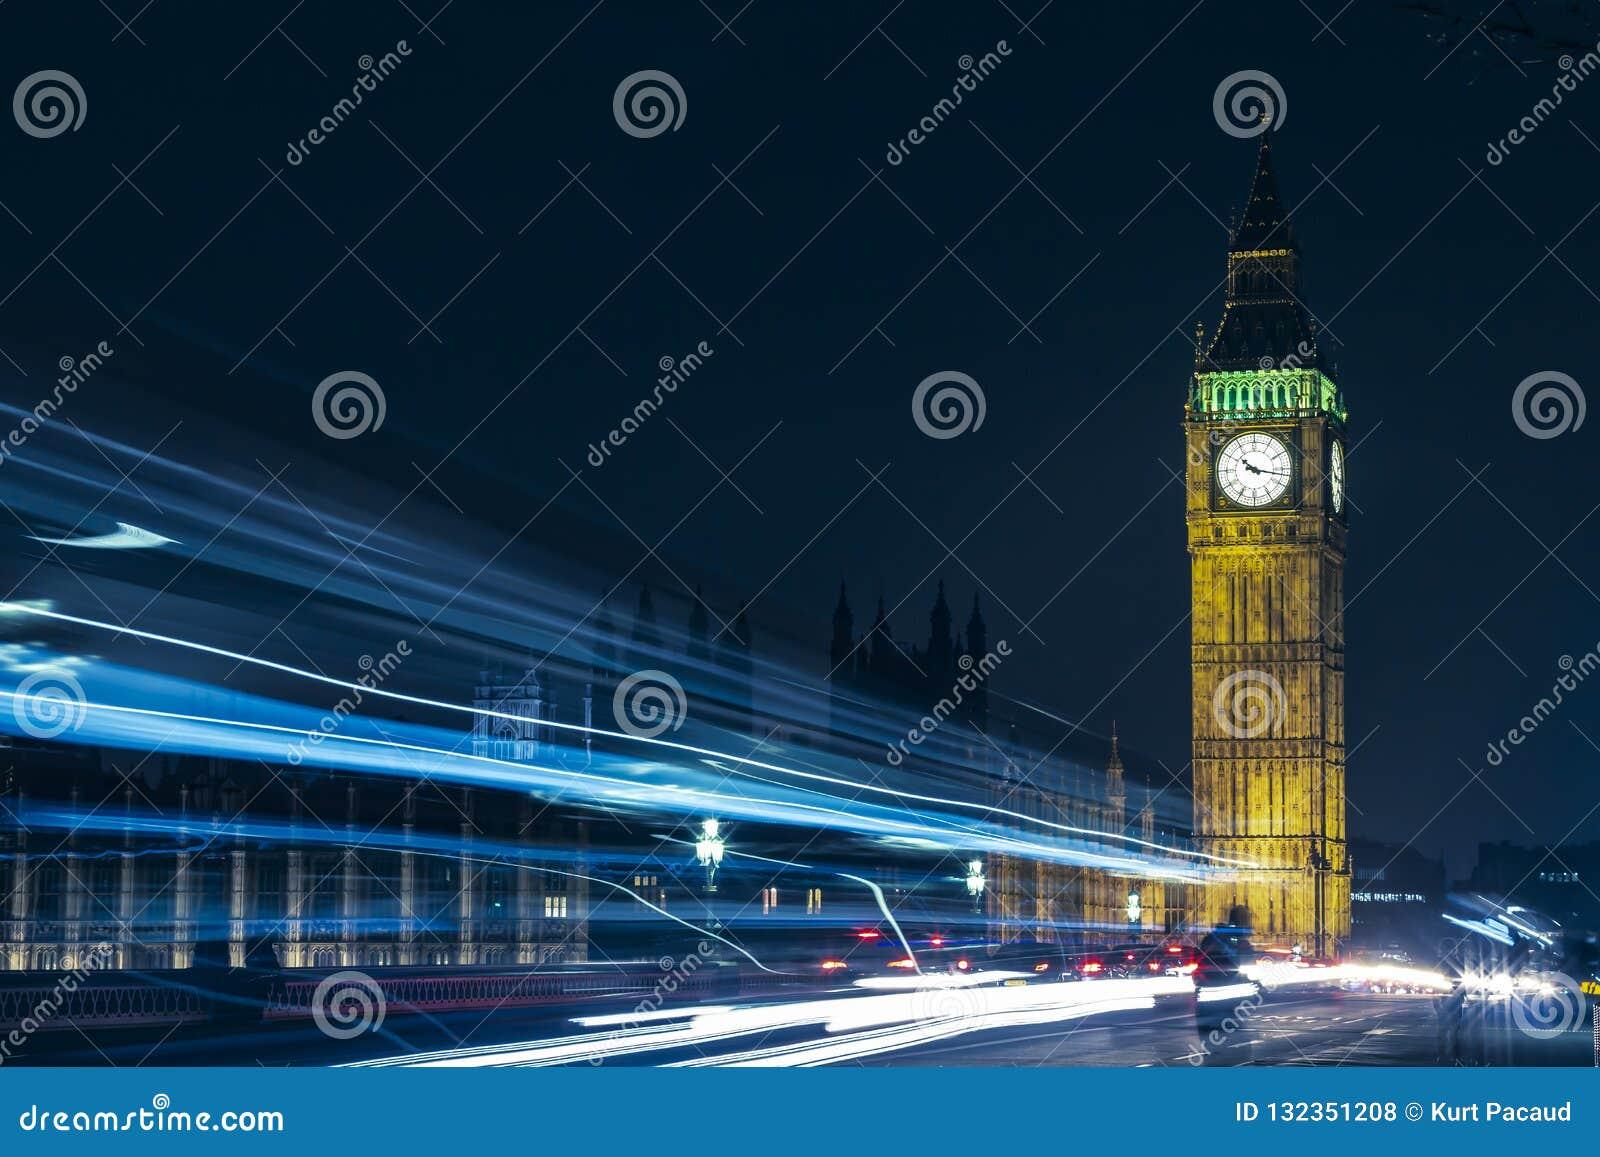 London großer Ben At Night Light Trails